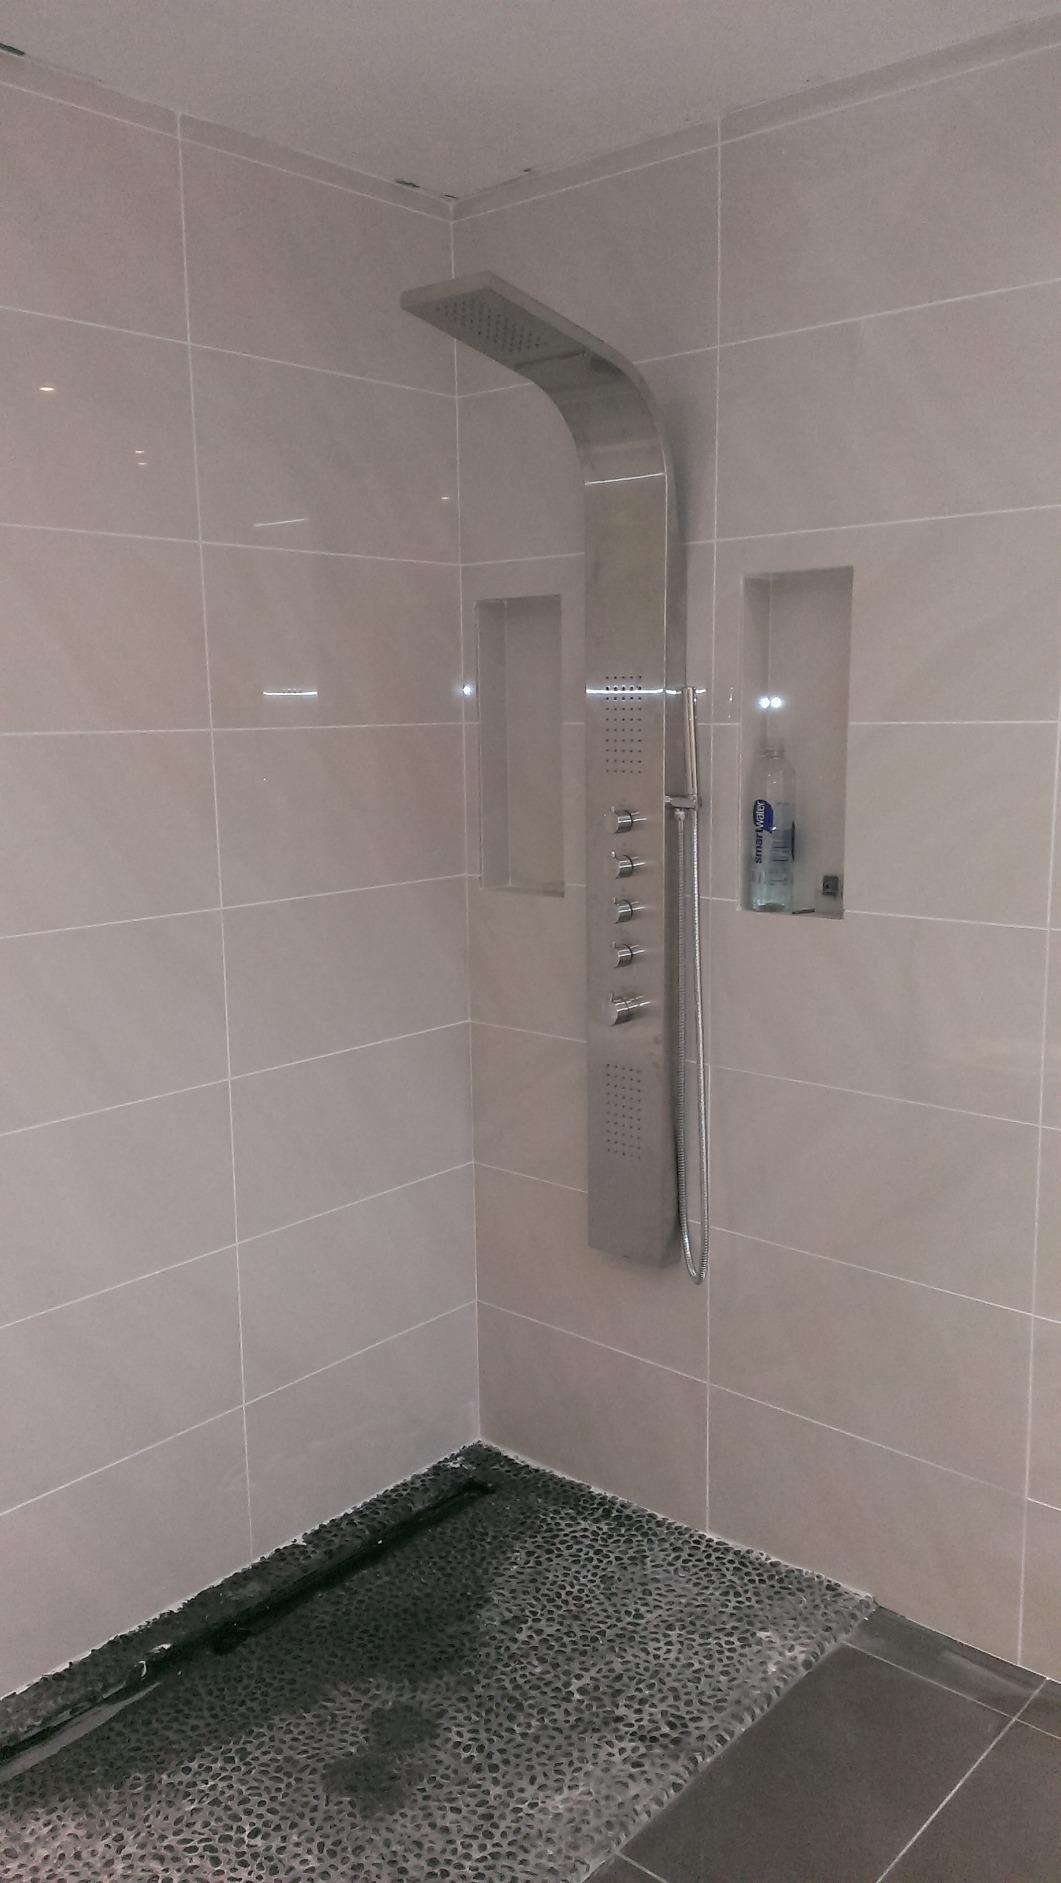 Best Shower Panel Reviews In 2020 Decoracion Banos Duchas Banos